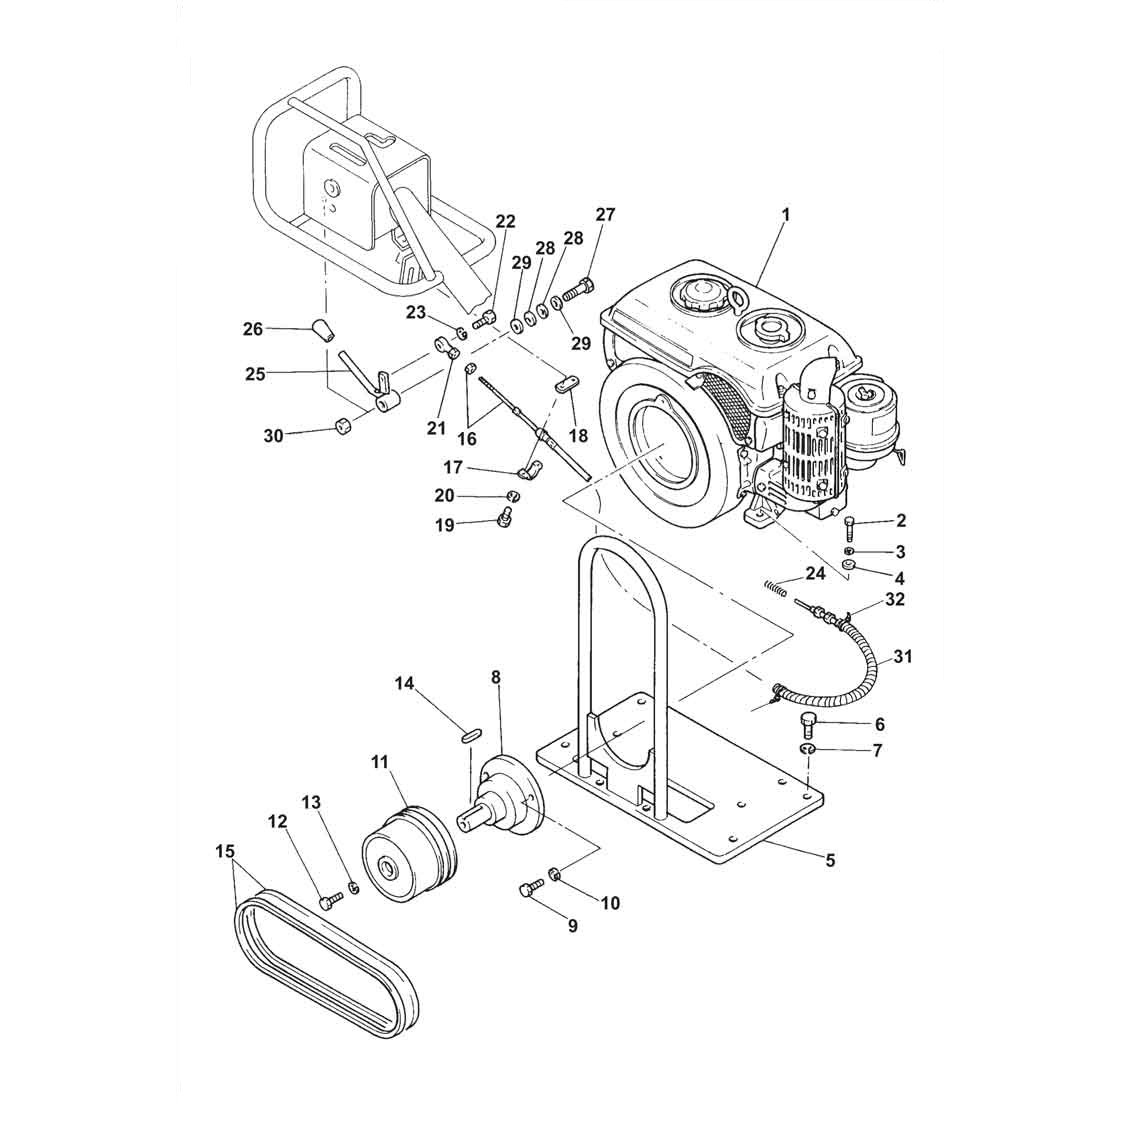 Belle BWR650 EA300 Roller Parts